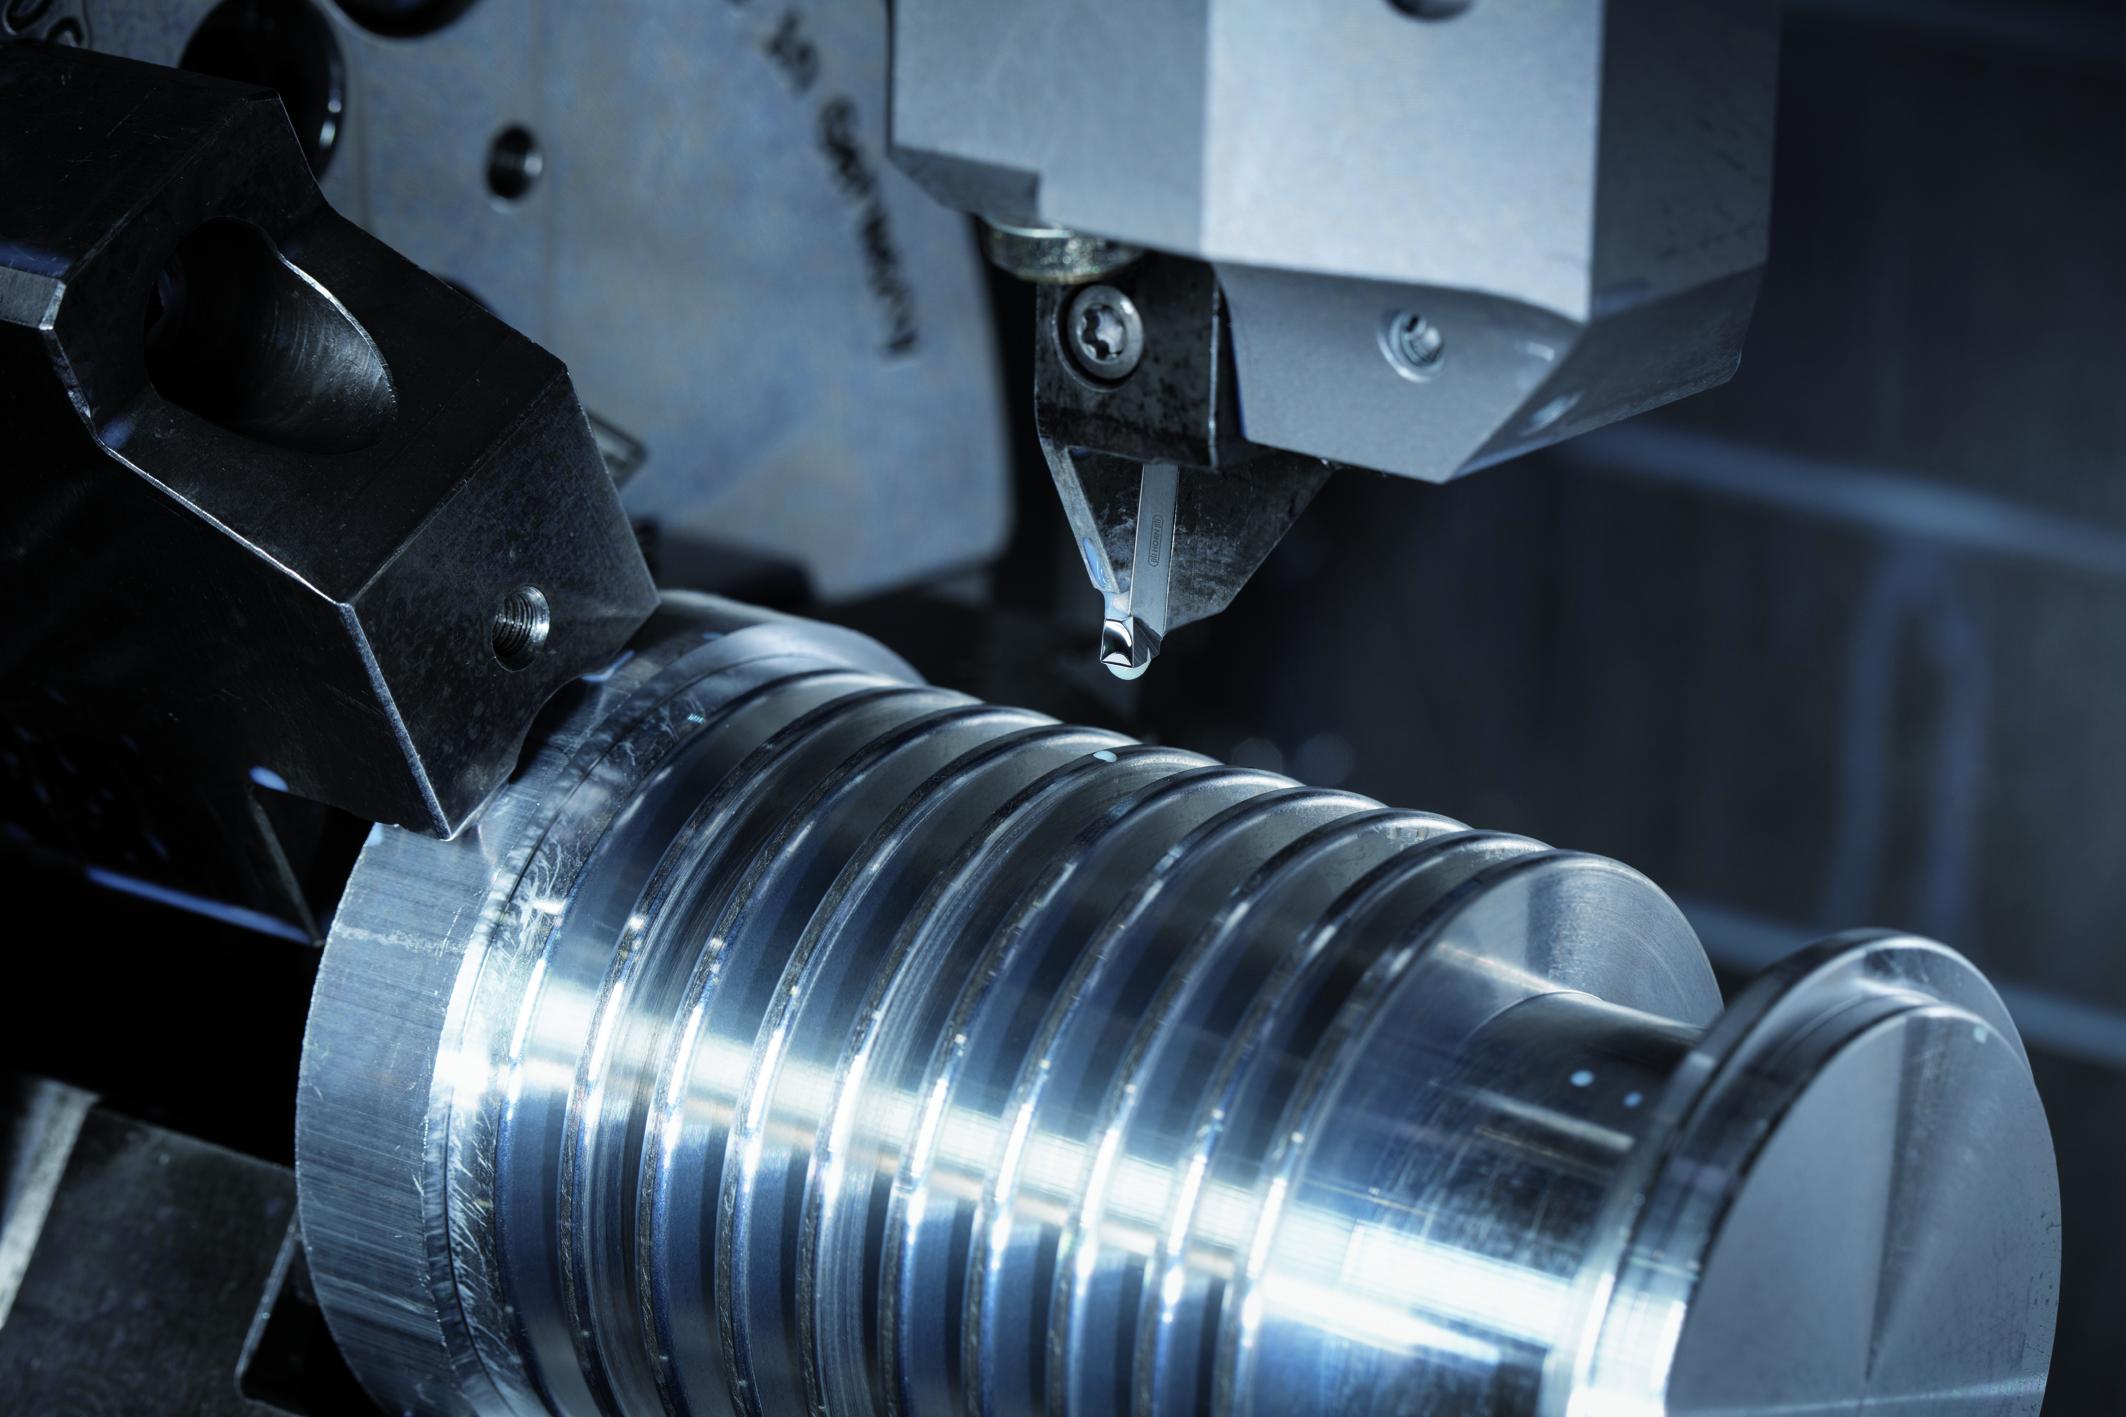 Working together in times of crisis Hartmetall-Werkzeugfabrik Paul Horn GmbH